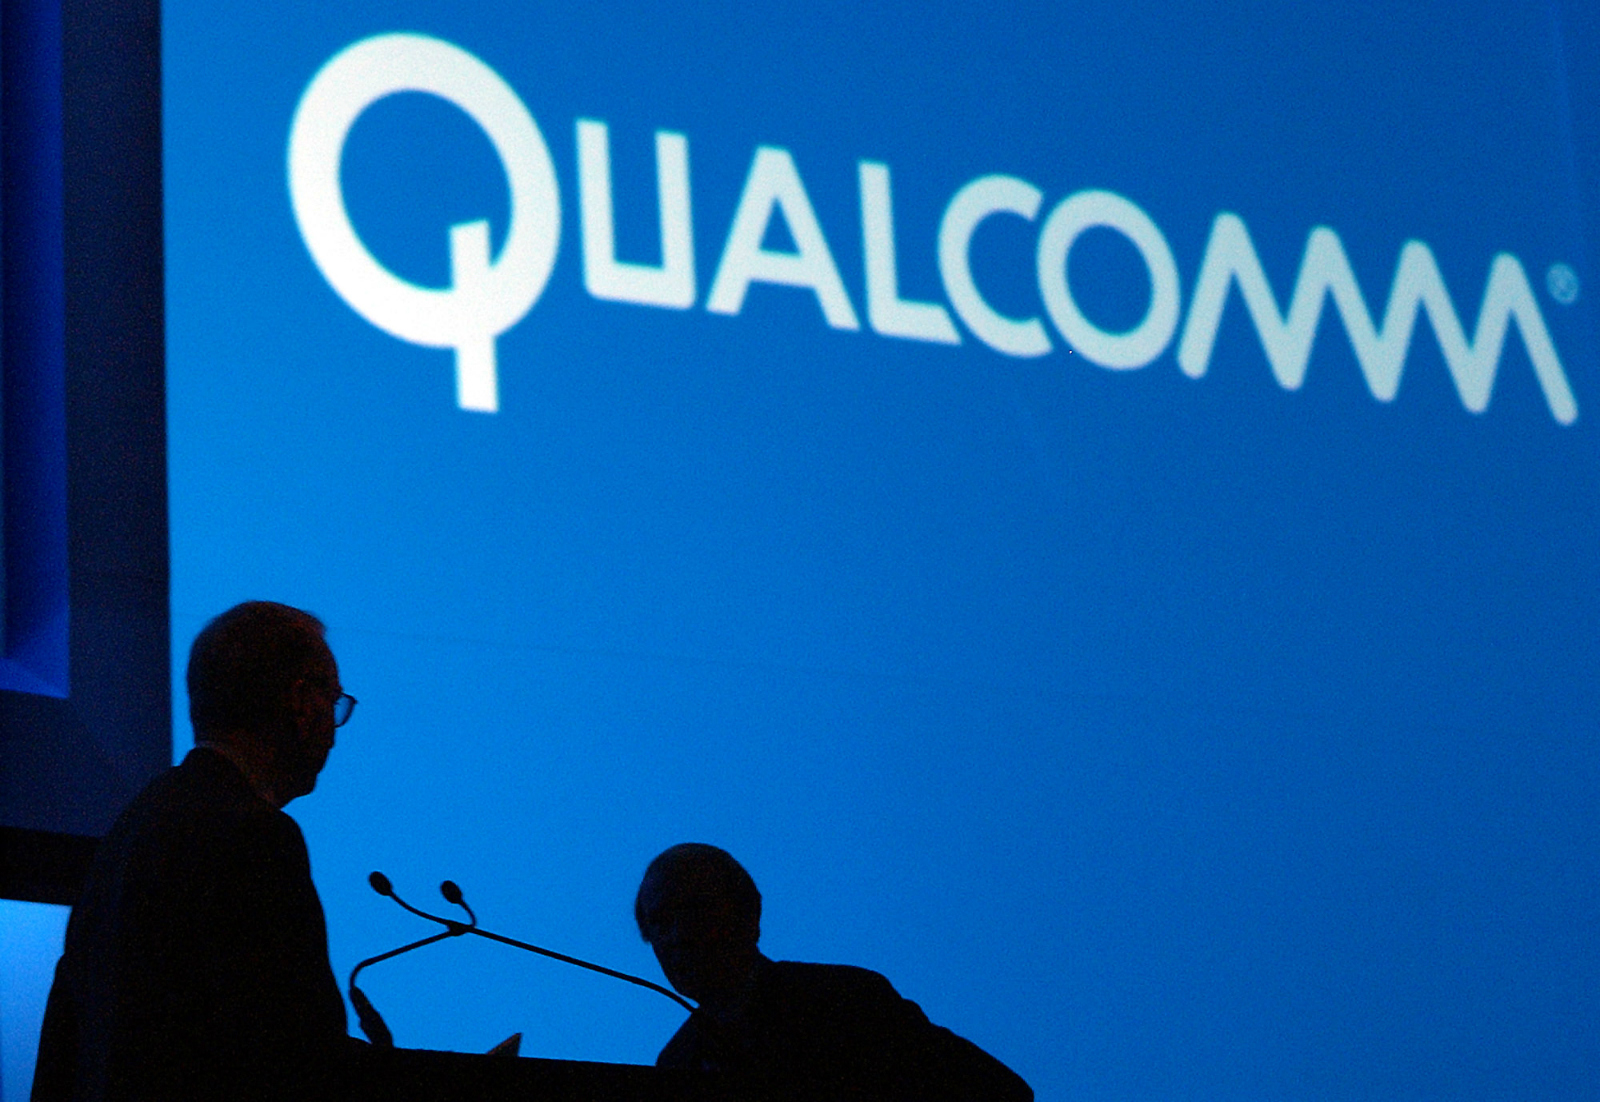 Qualcomm a primit o amenda record in Coreea de Sud, ca urmare a unui proces de abuz